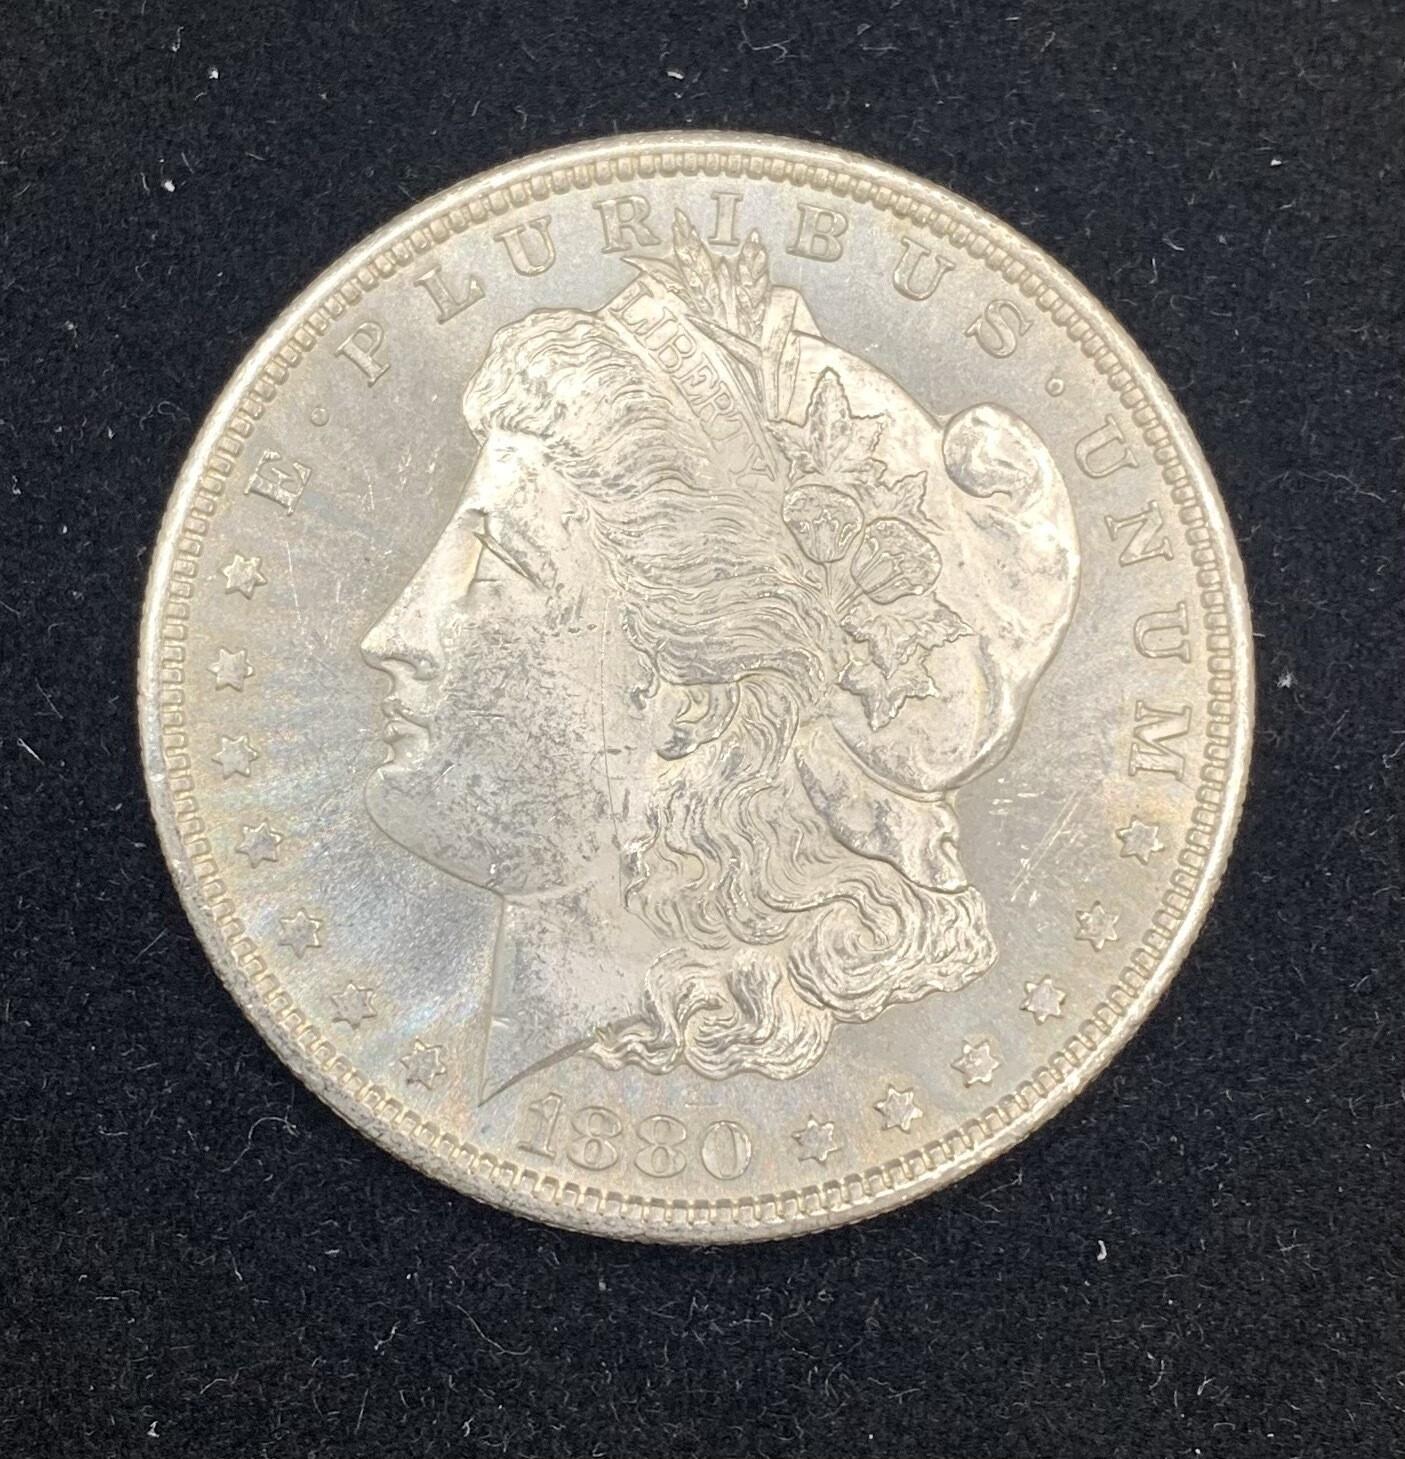 1880 S Morgan Silver Dollar - San Francisco Mint